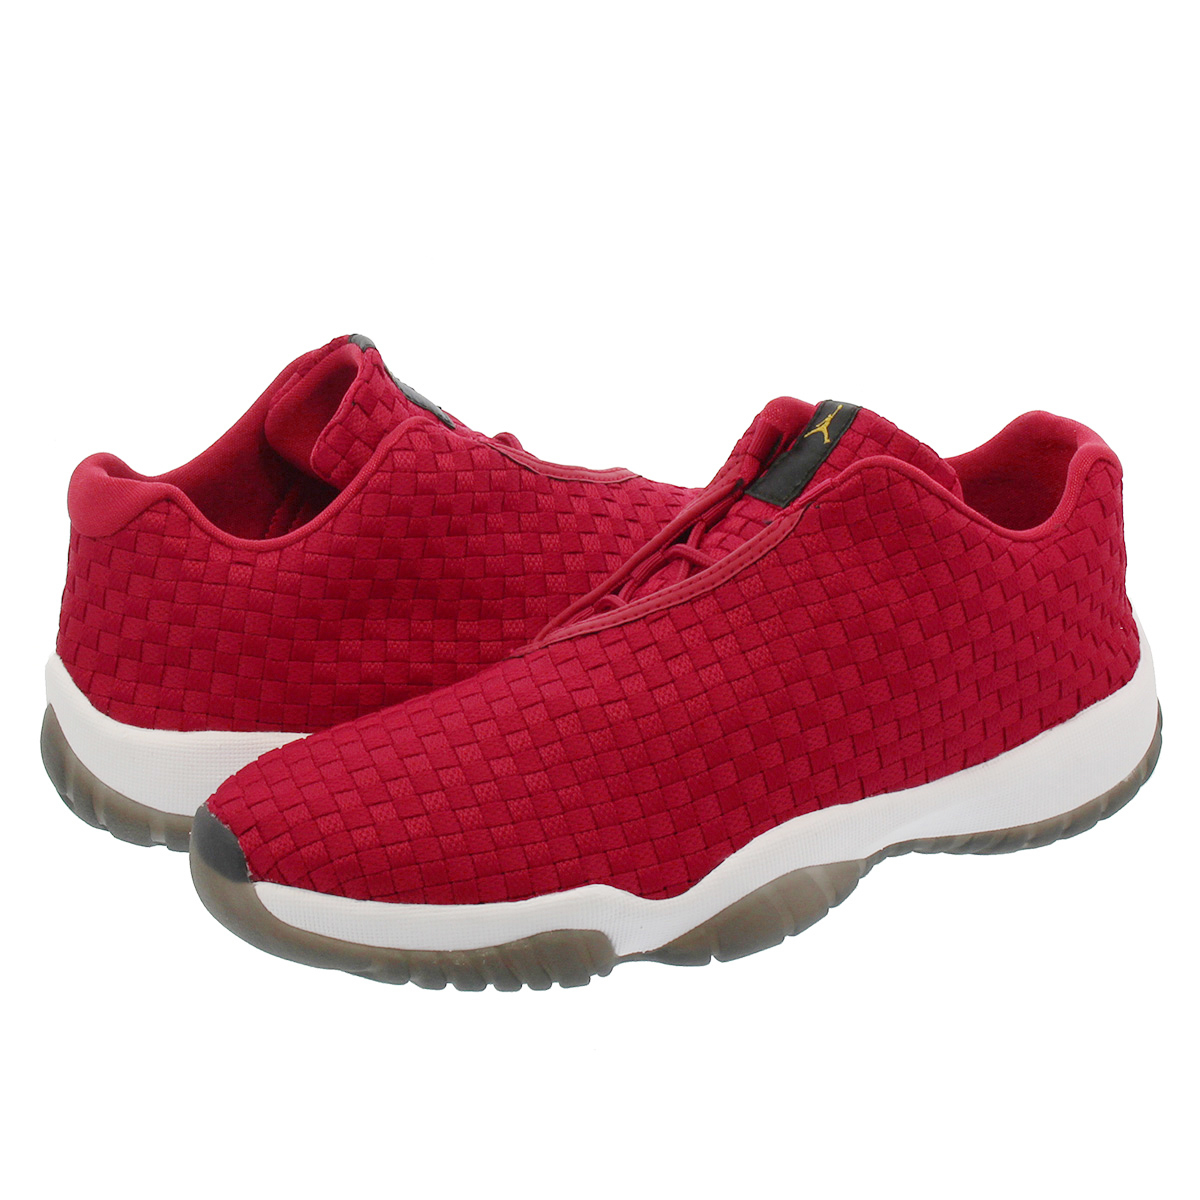 NIKE AIR JORDAN FUTURE LOW Nike Air Jordan future low GYM RED WHITE BLACK  718 bb3ab640fe